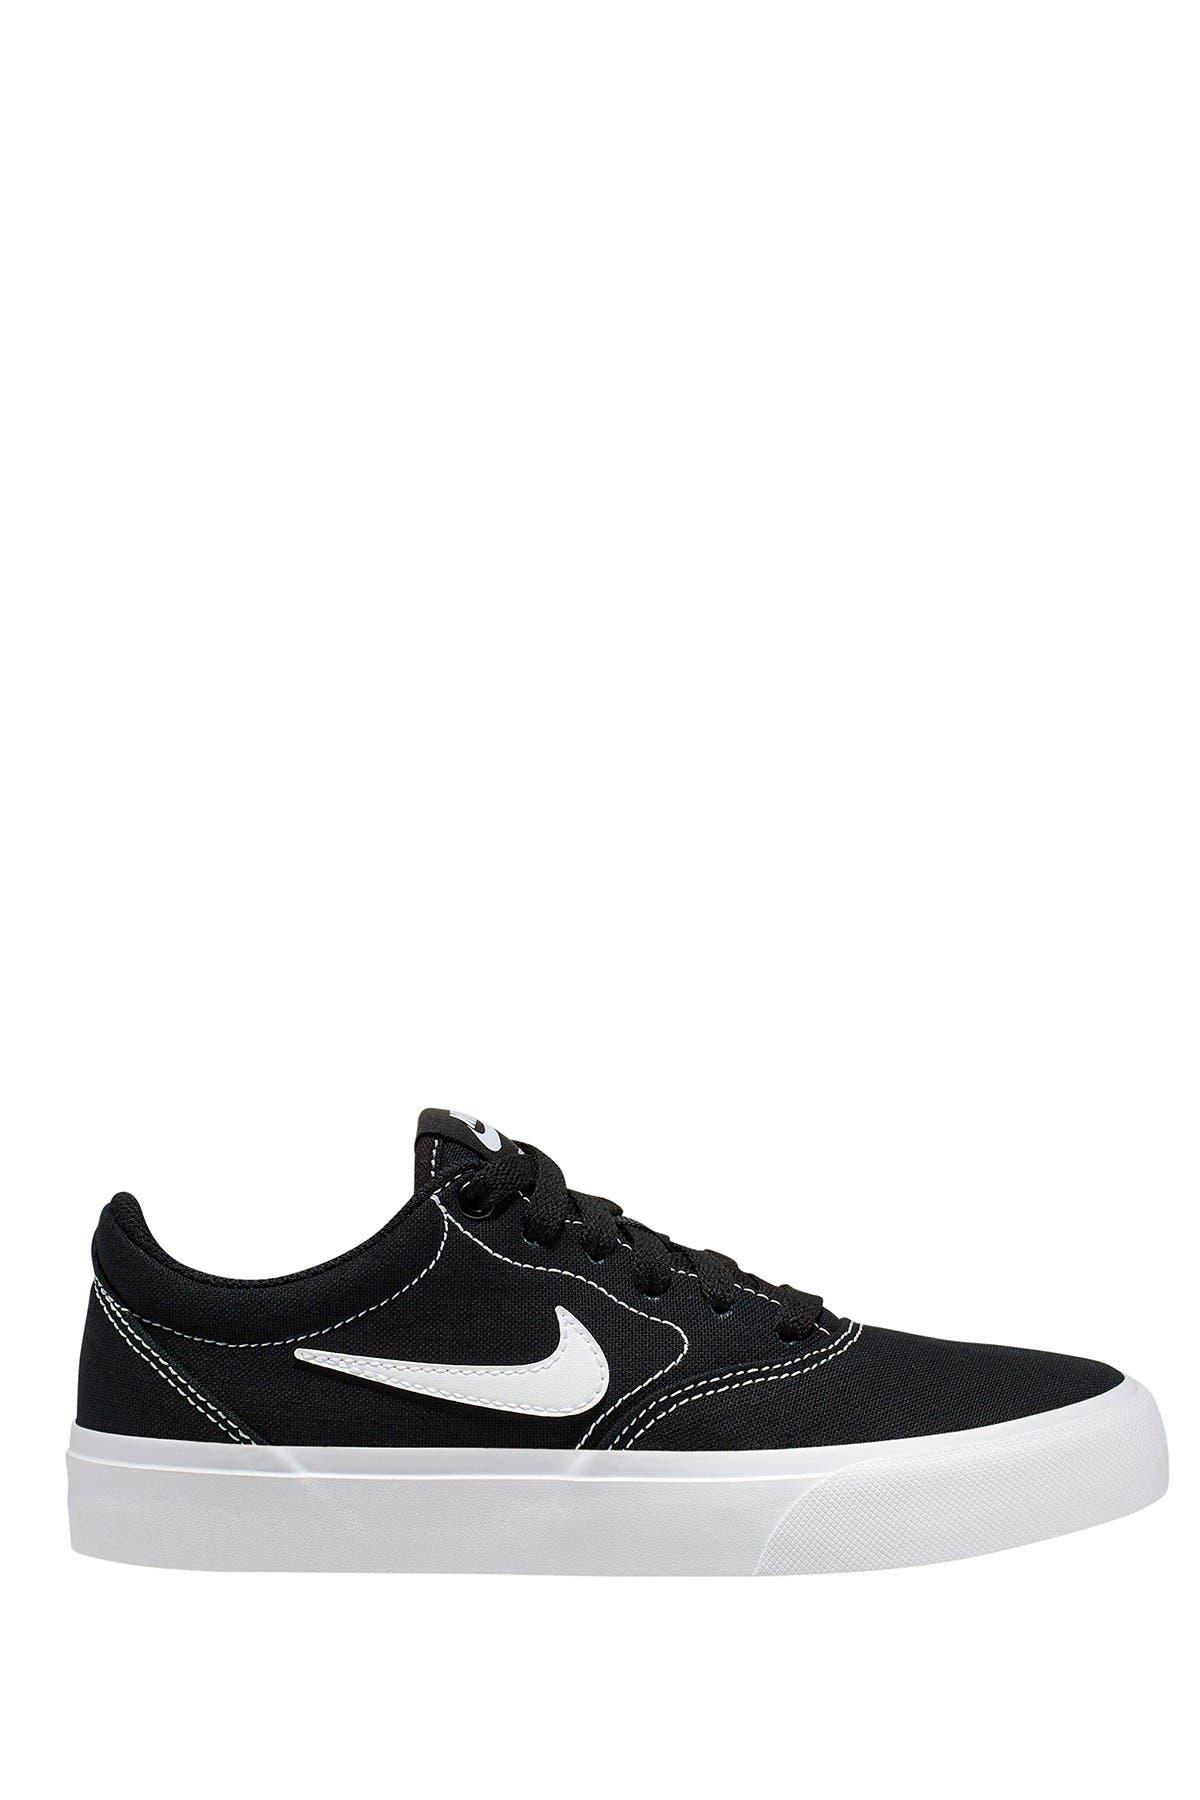 Image of Nike SB Charge Canvas Skate Shoe